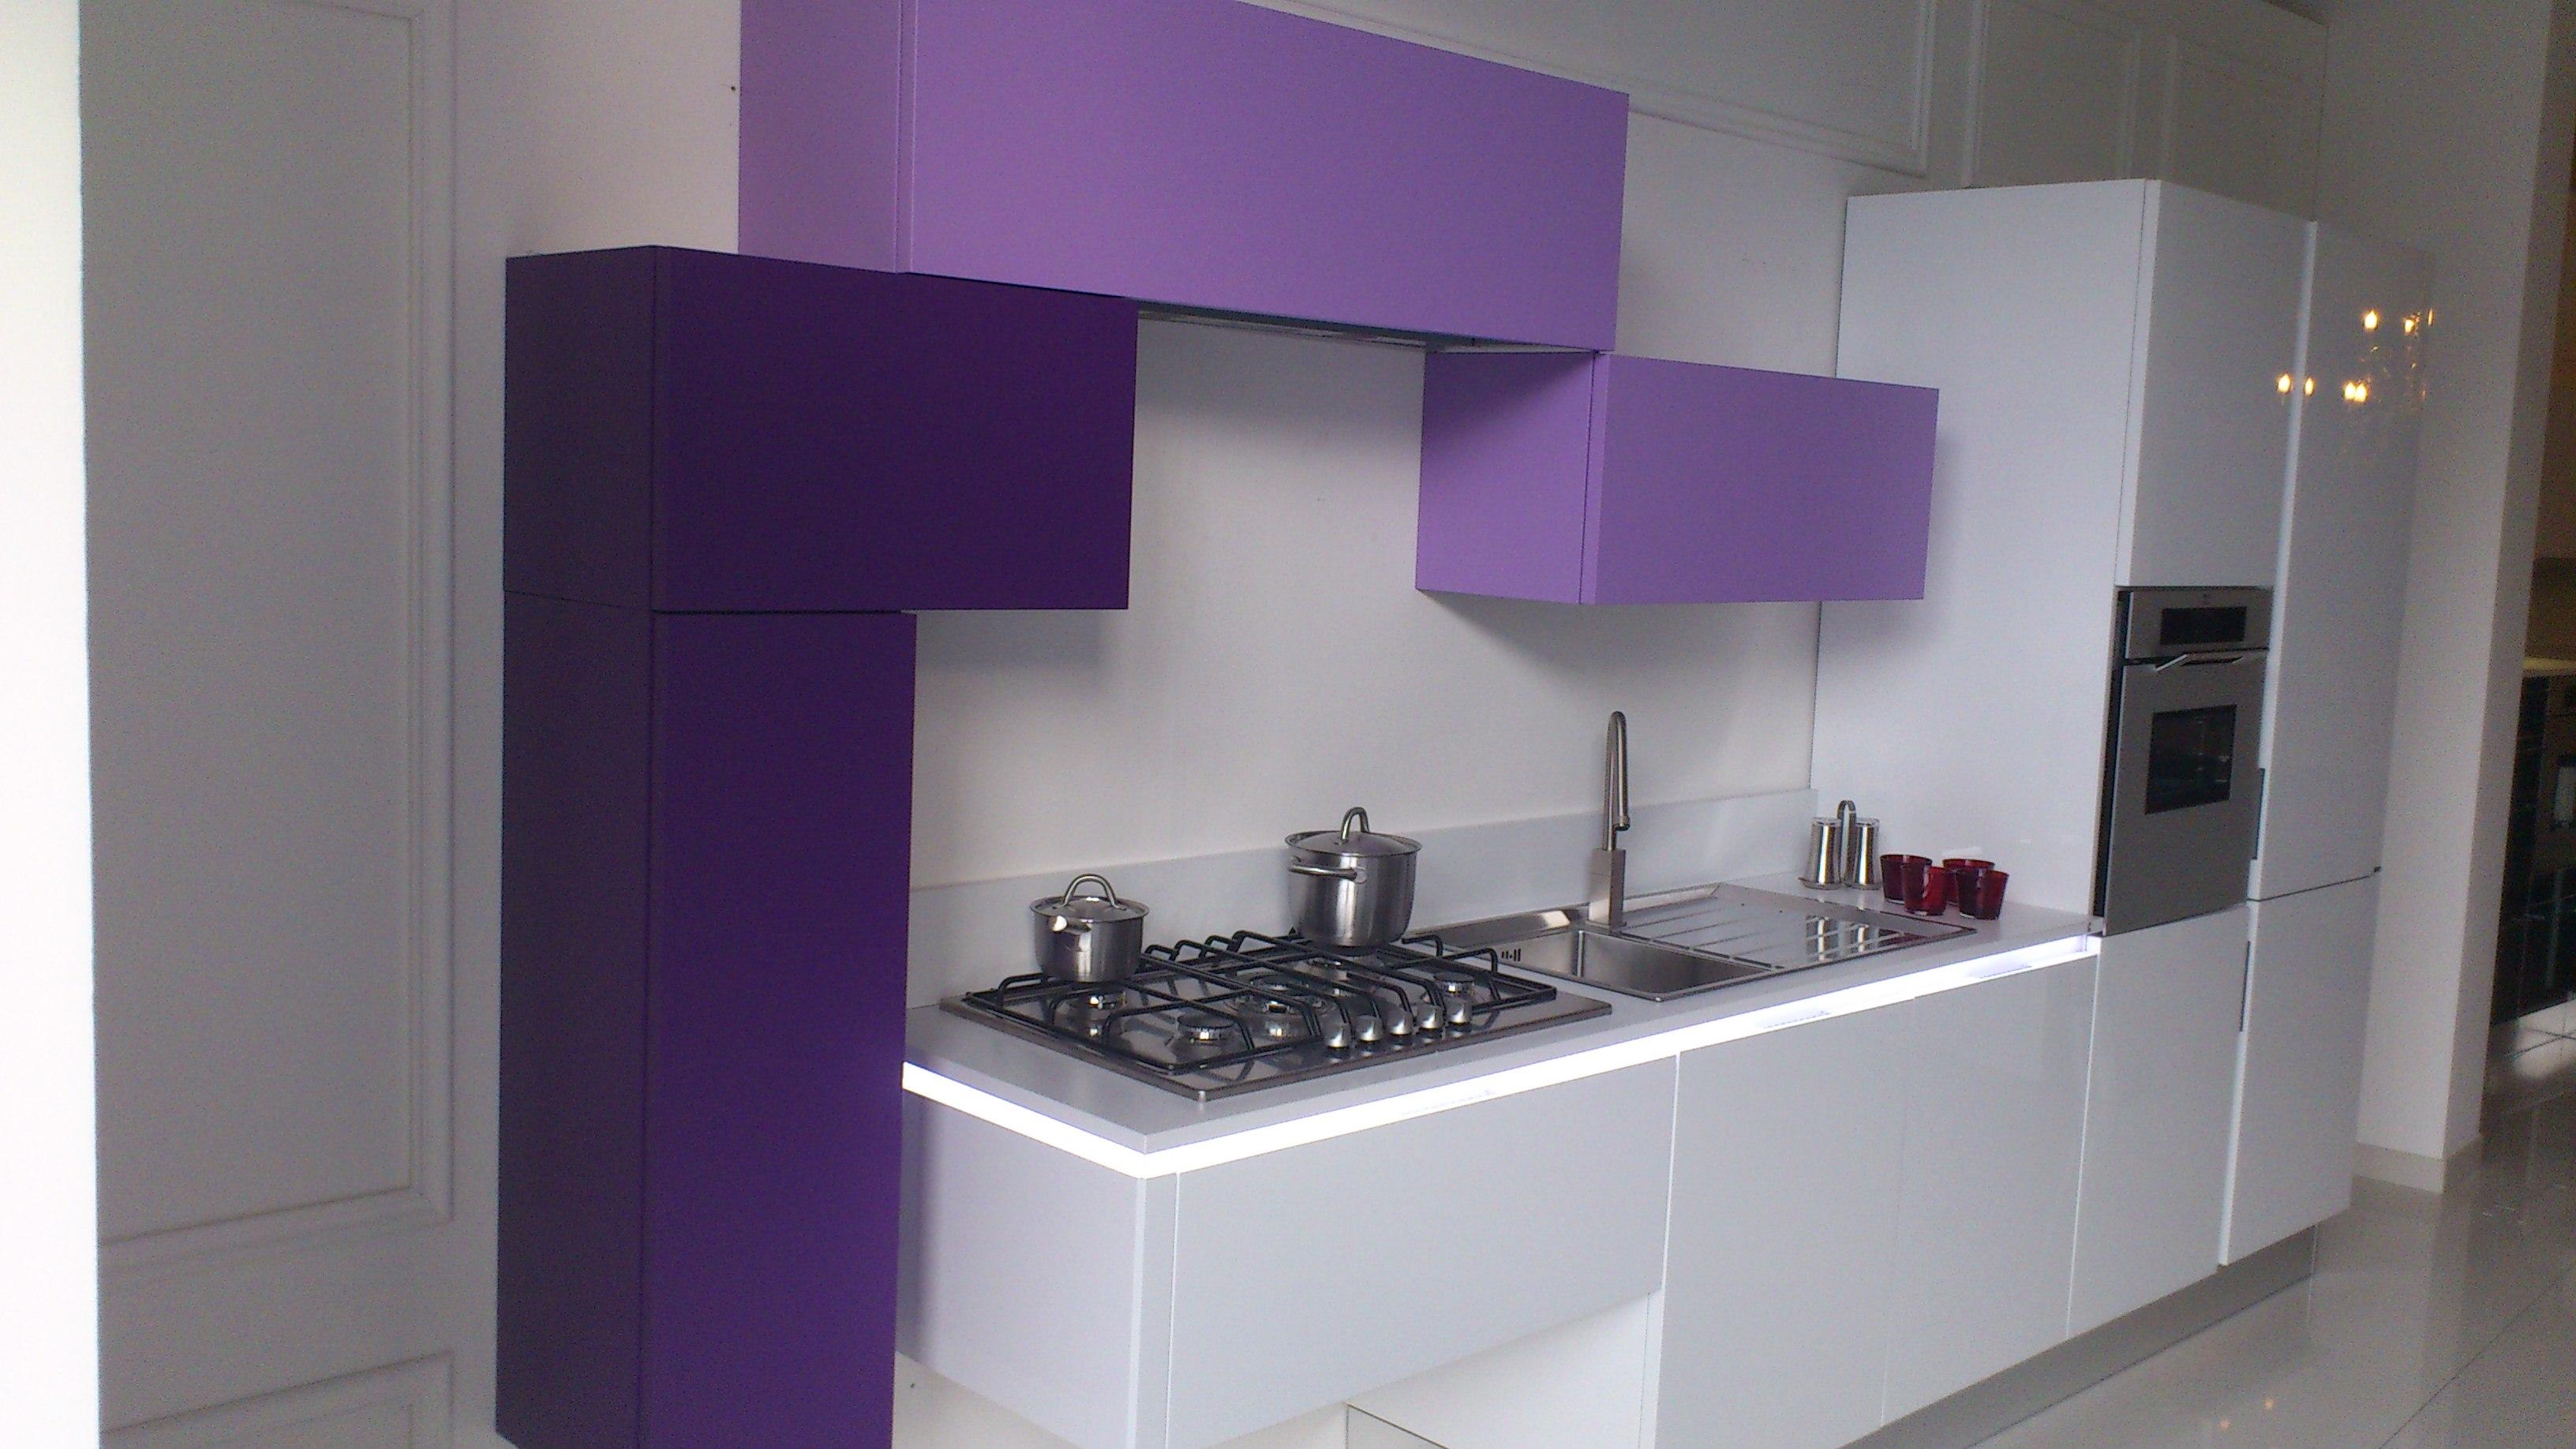 Beautiful cucine occasione design ideas acrylicgiftware - Strato cucine outlet ...